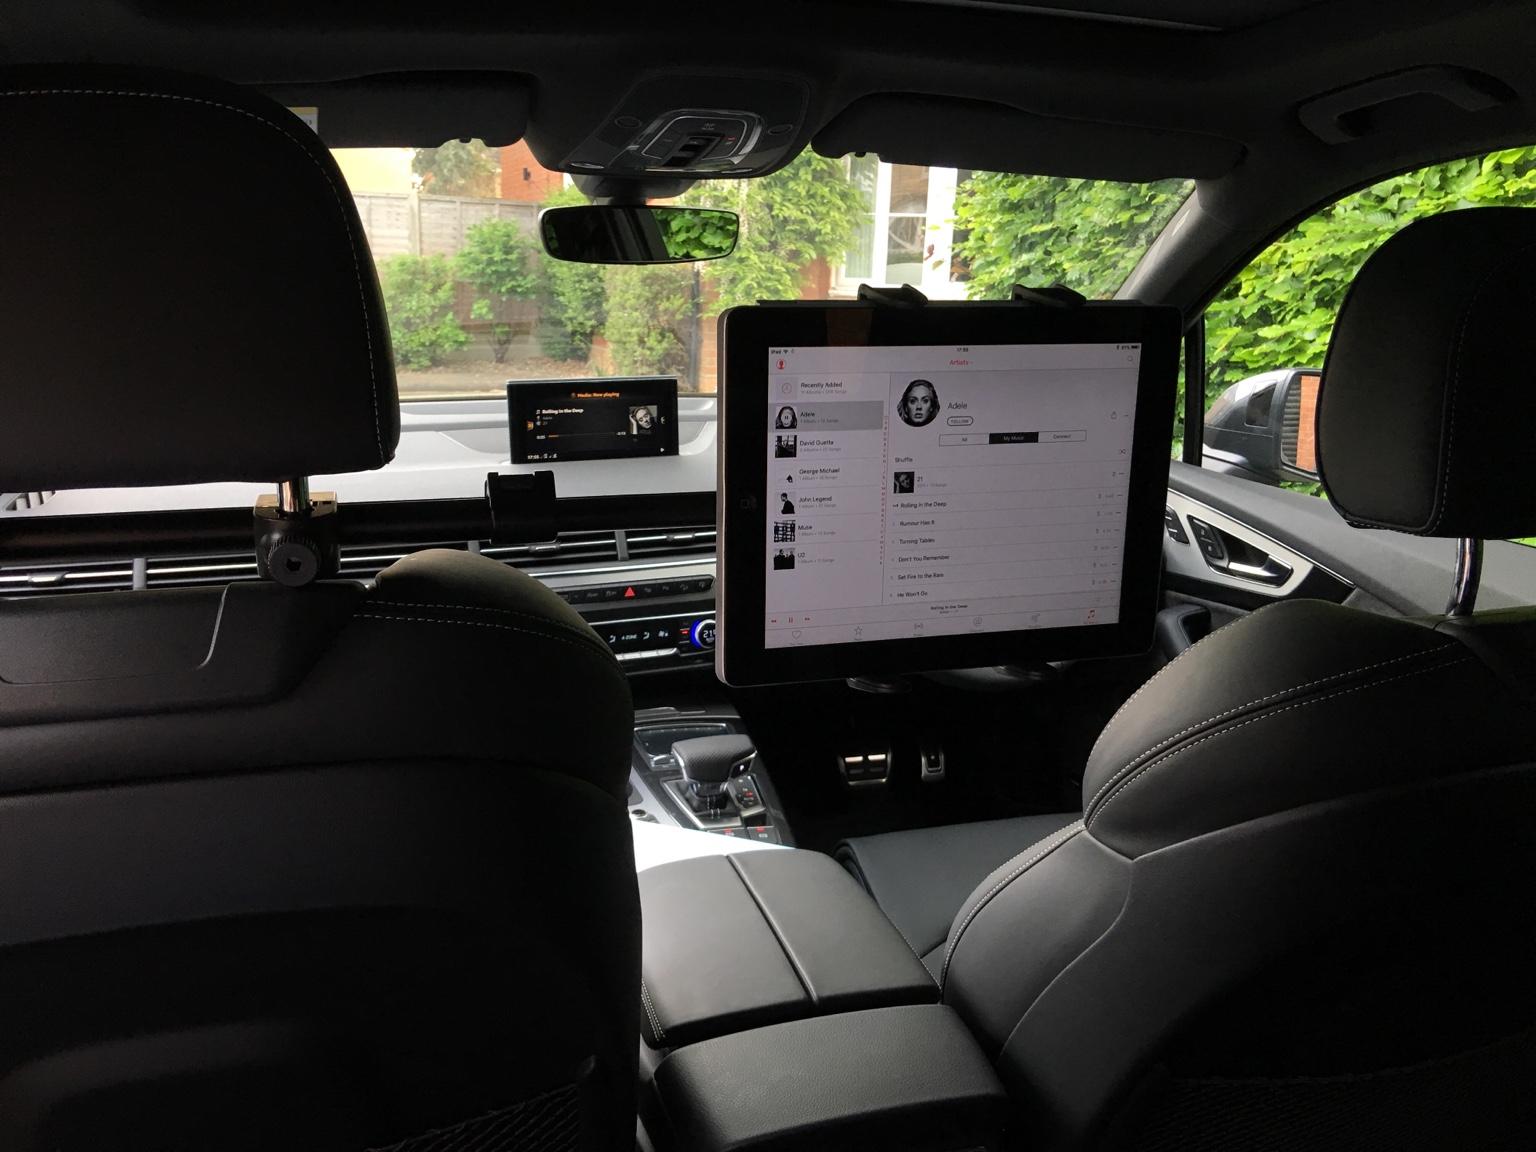 ipad rear seat entertainment. Black Bedroom Furniture Sets. Home Design Ideas